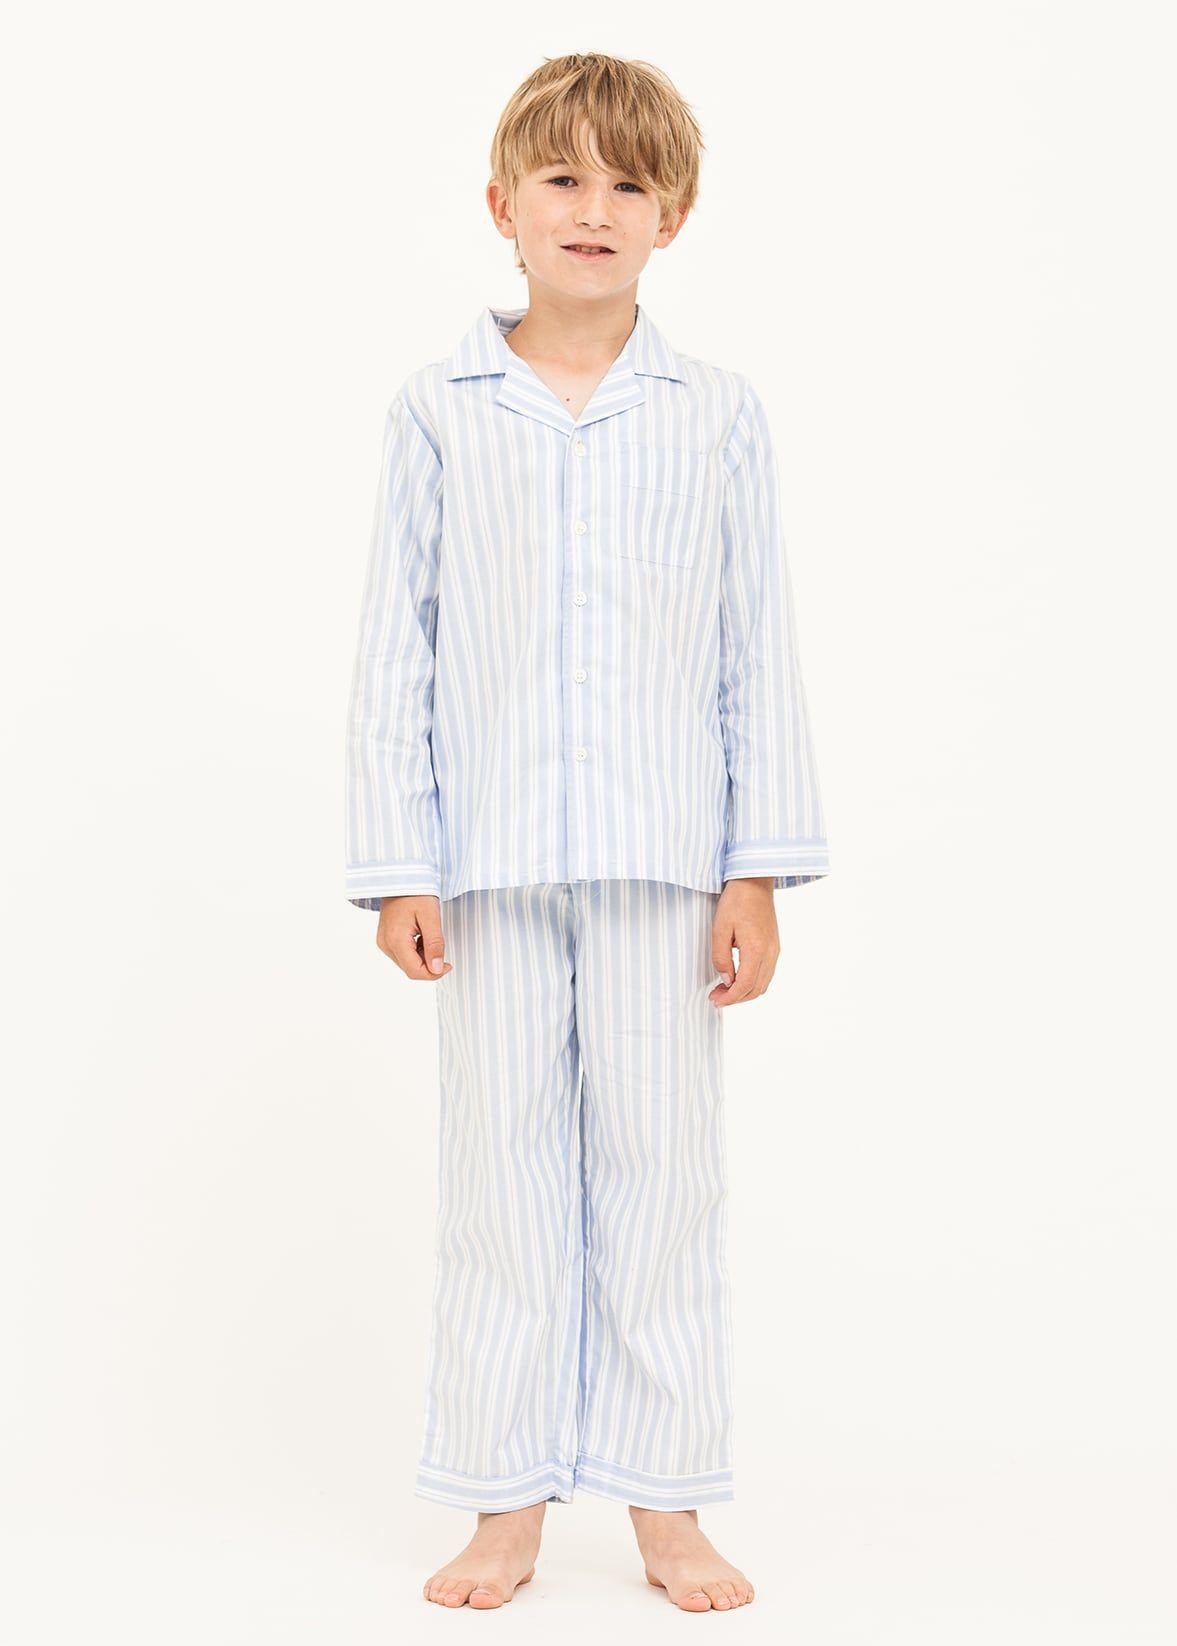 60ef199f8d04 Boys Blue   White Striped Pyjamas